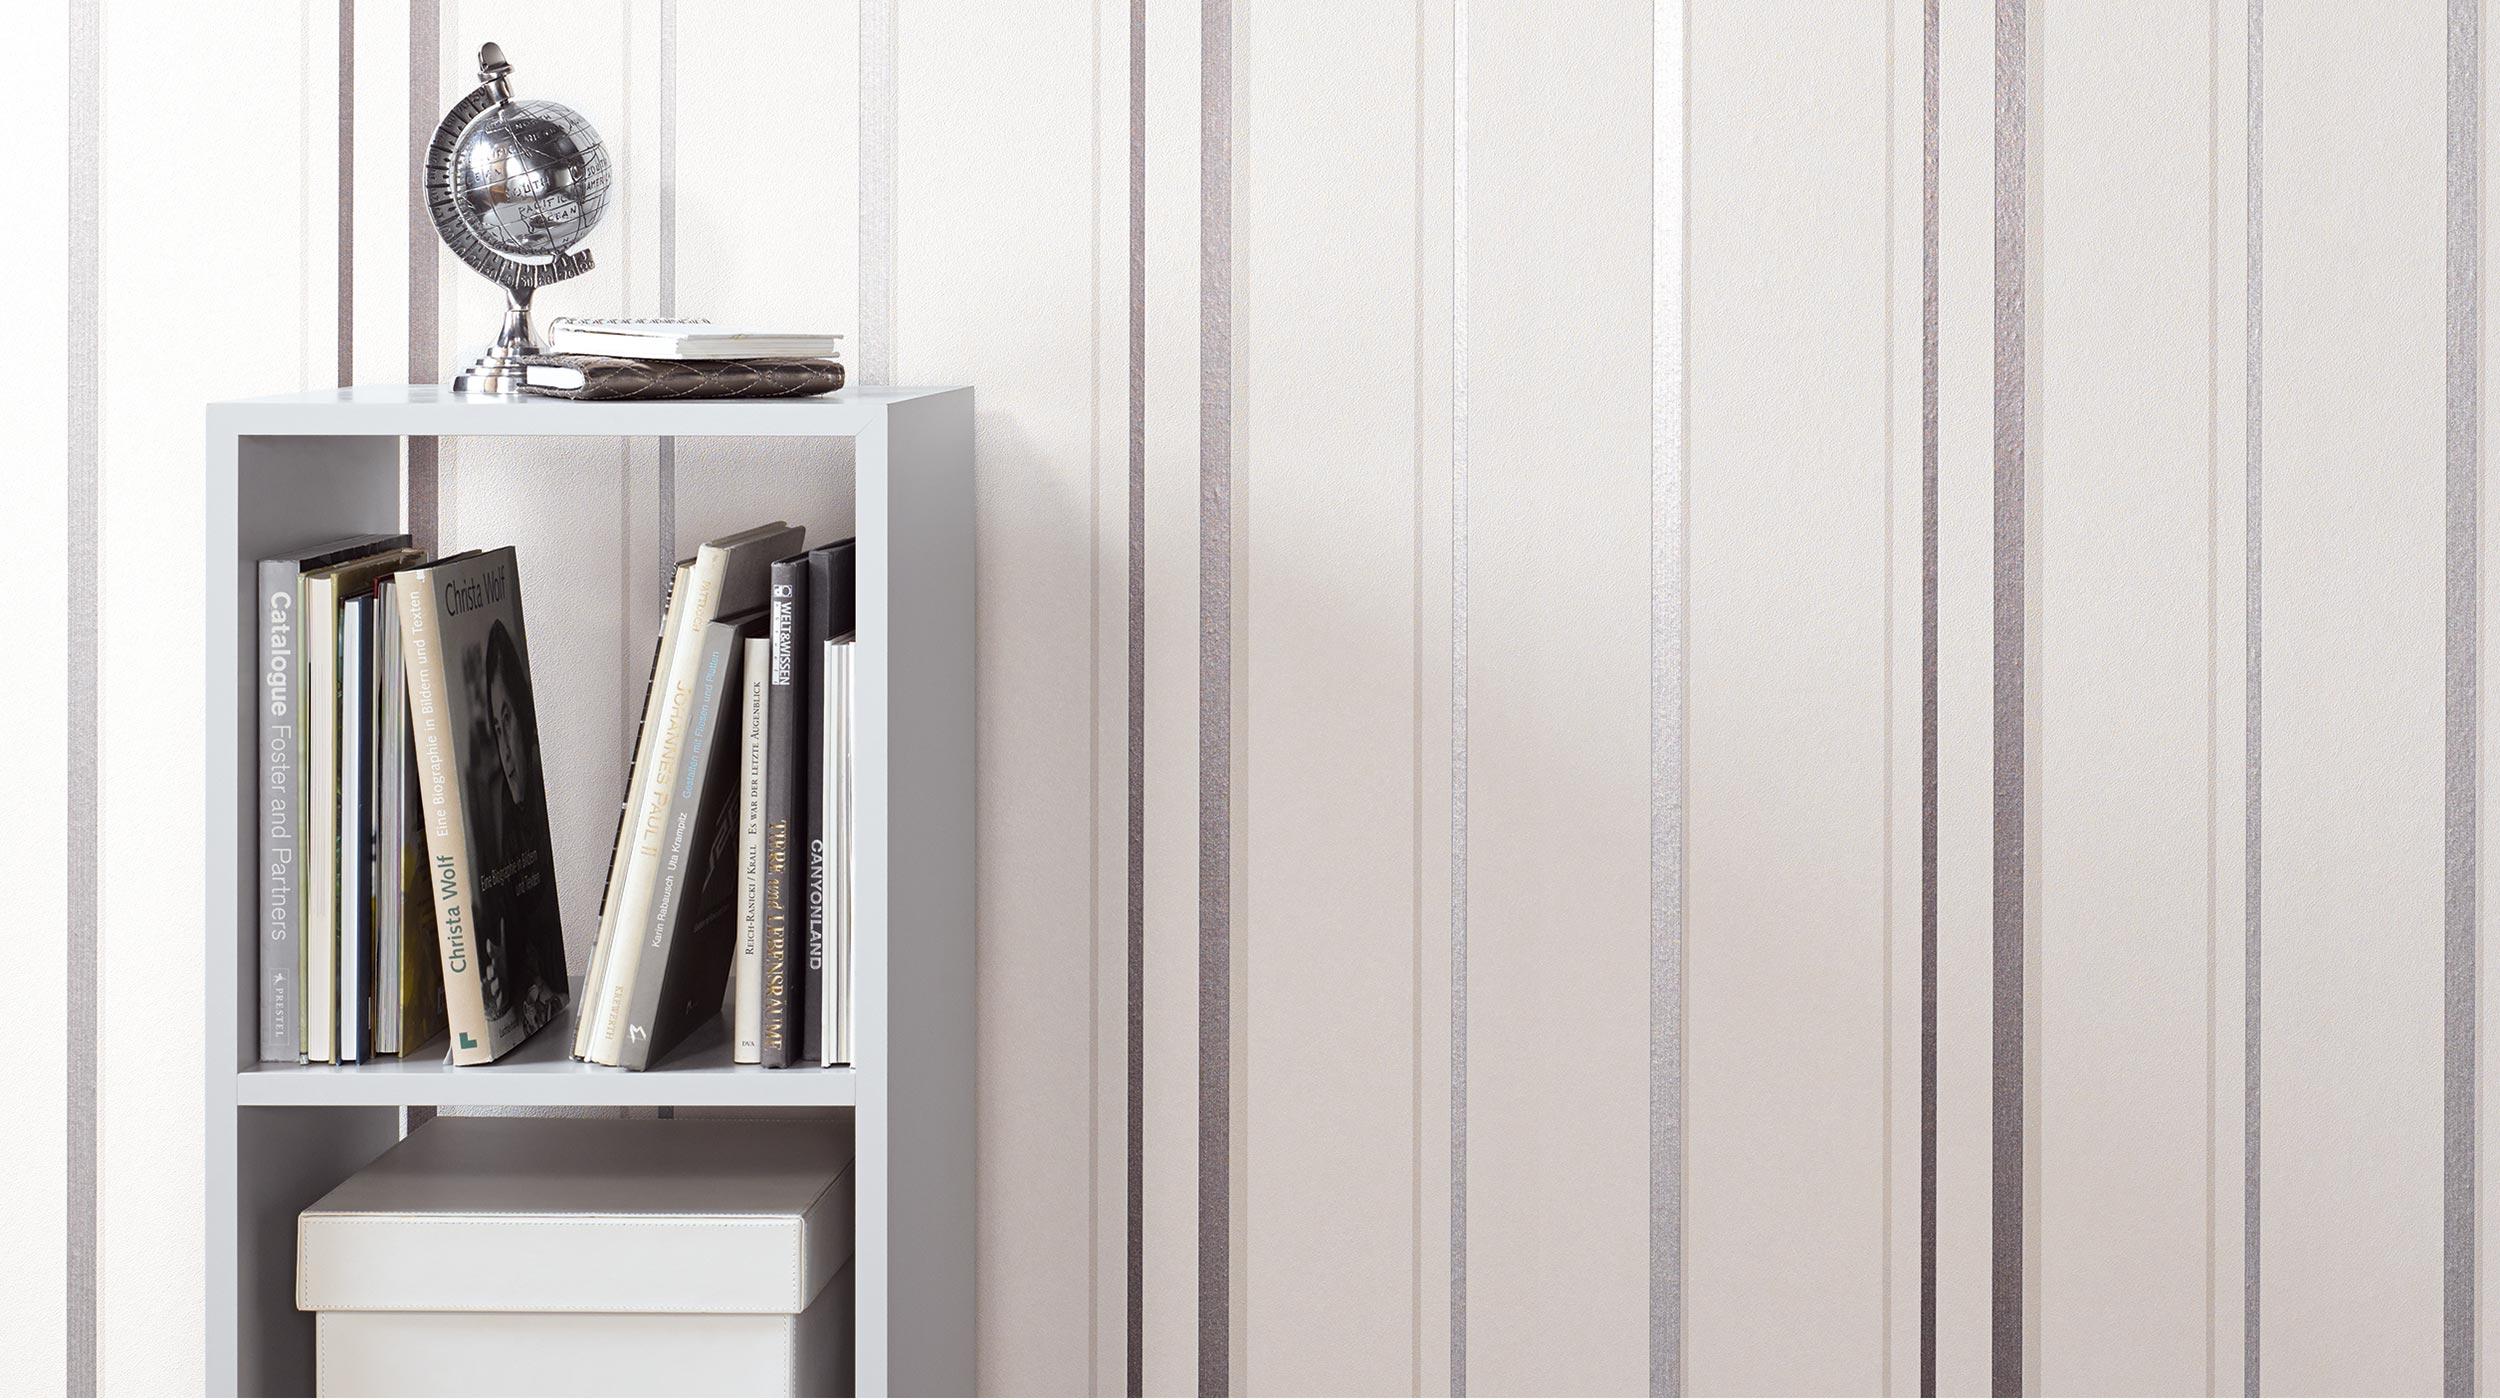 isabella erismann cie gmbh. Black Bedroom Furniture Sets. Home Design Ideas